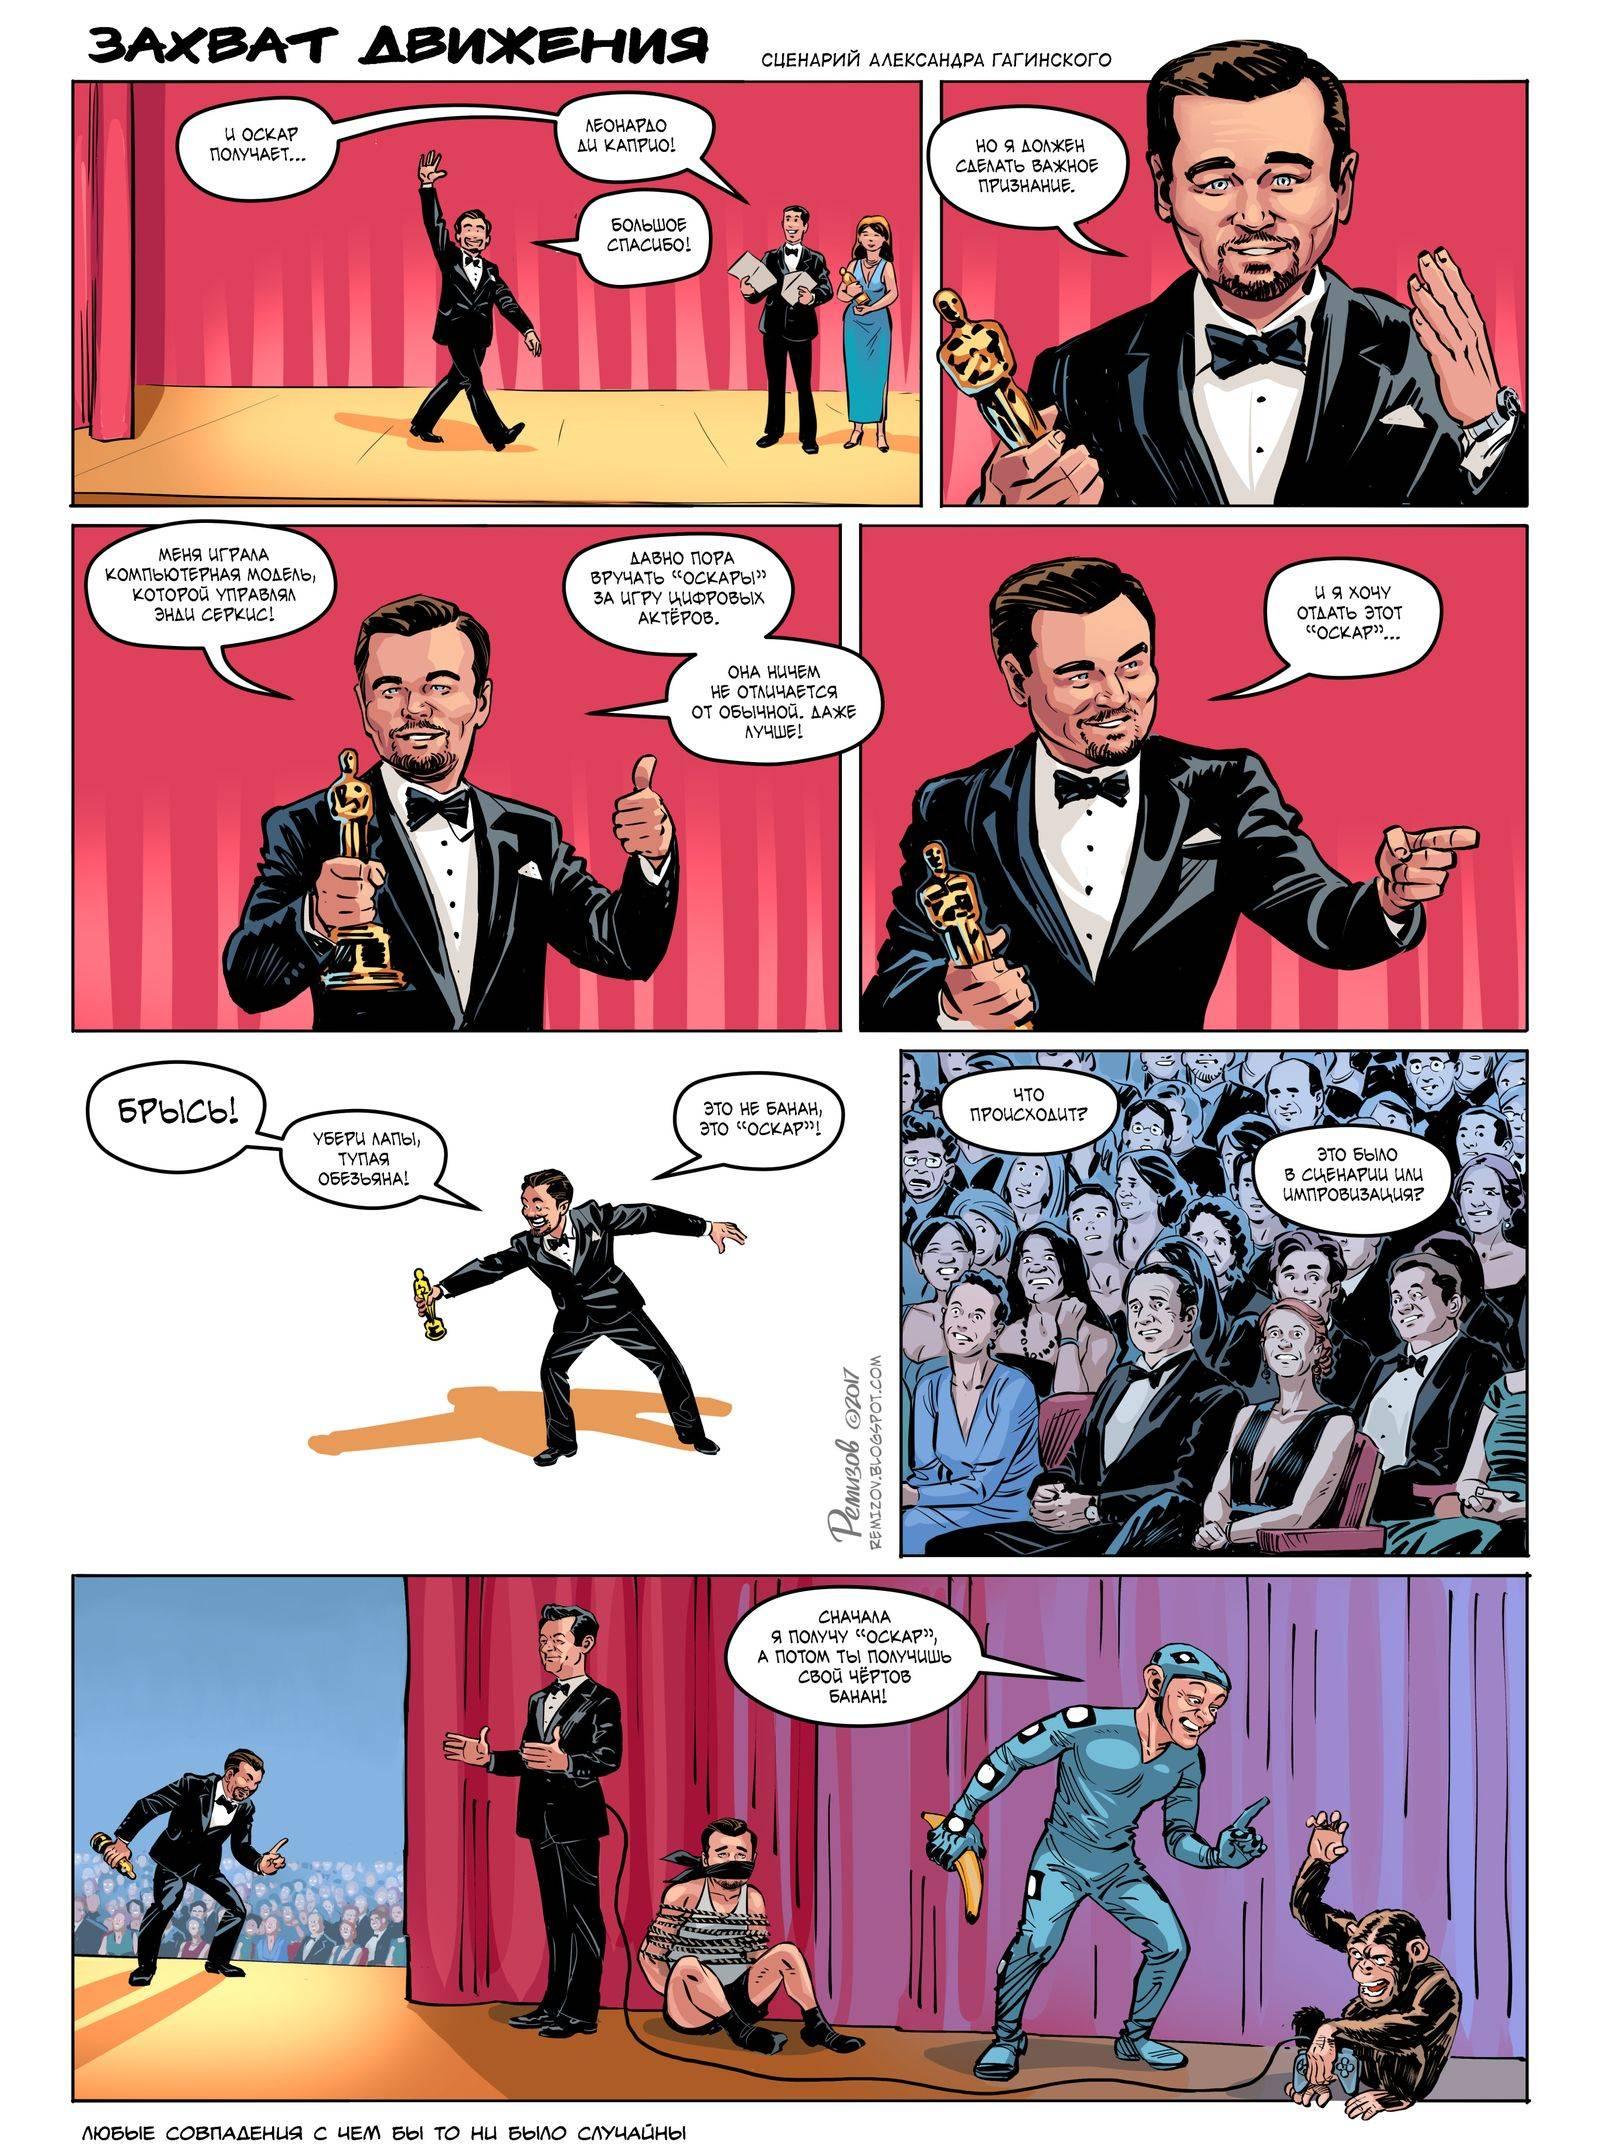 Комикс: Захват движений 1